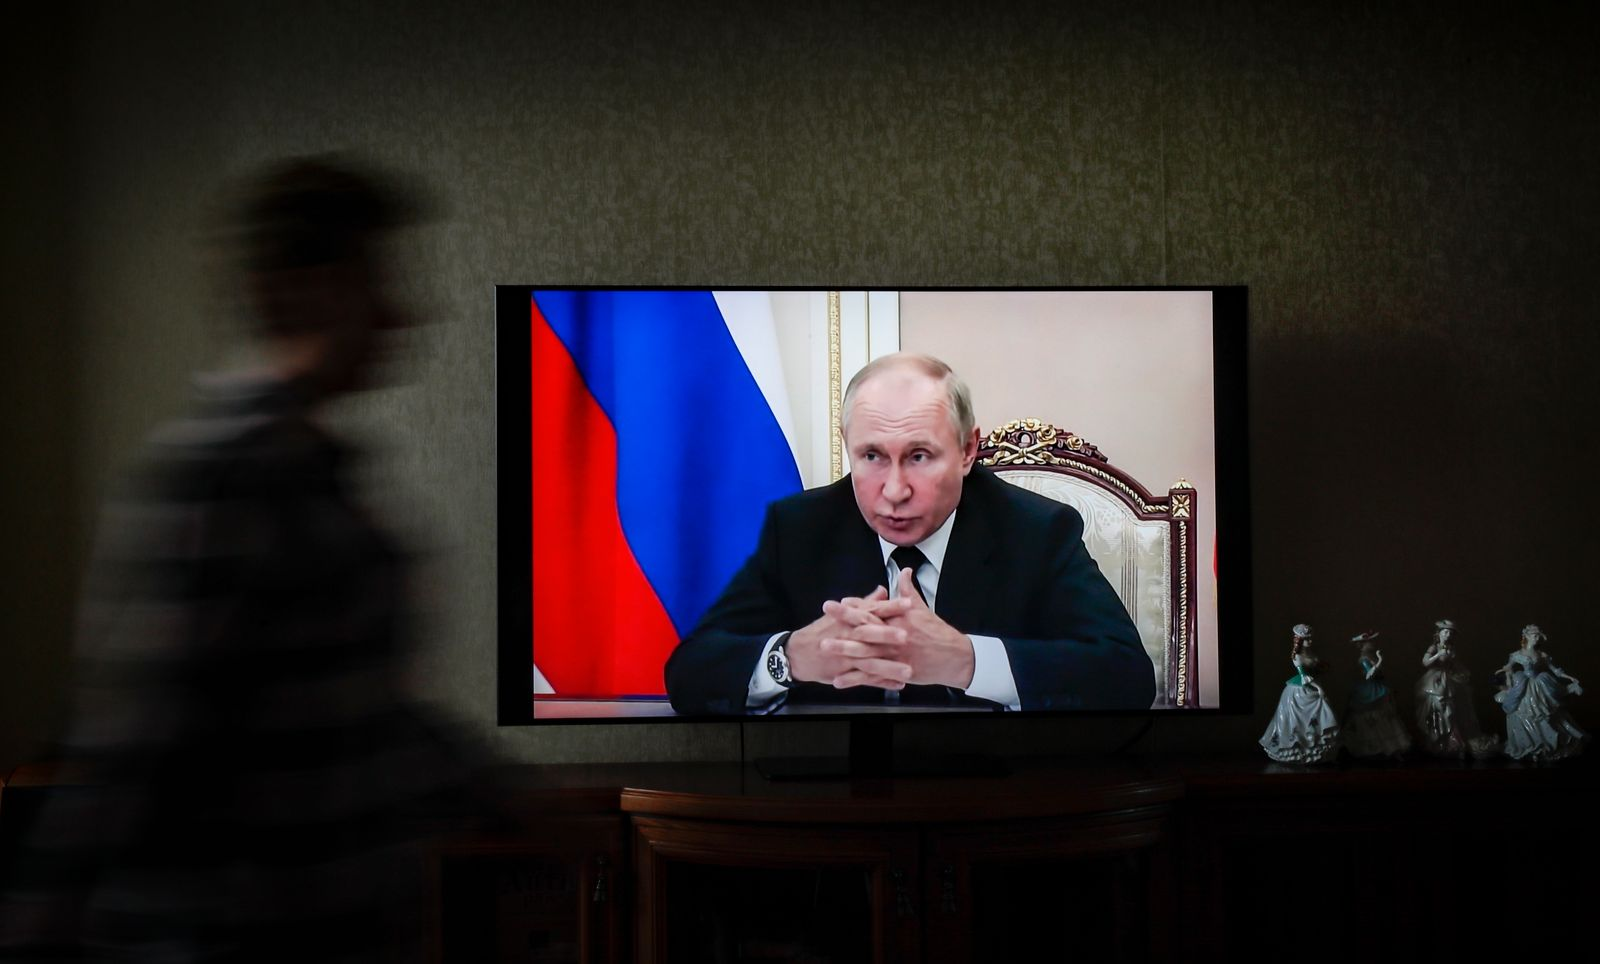 Vladimir Putin is in self-isolation